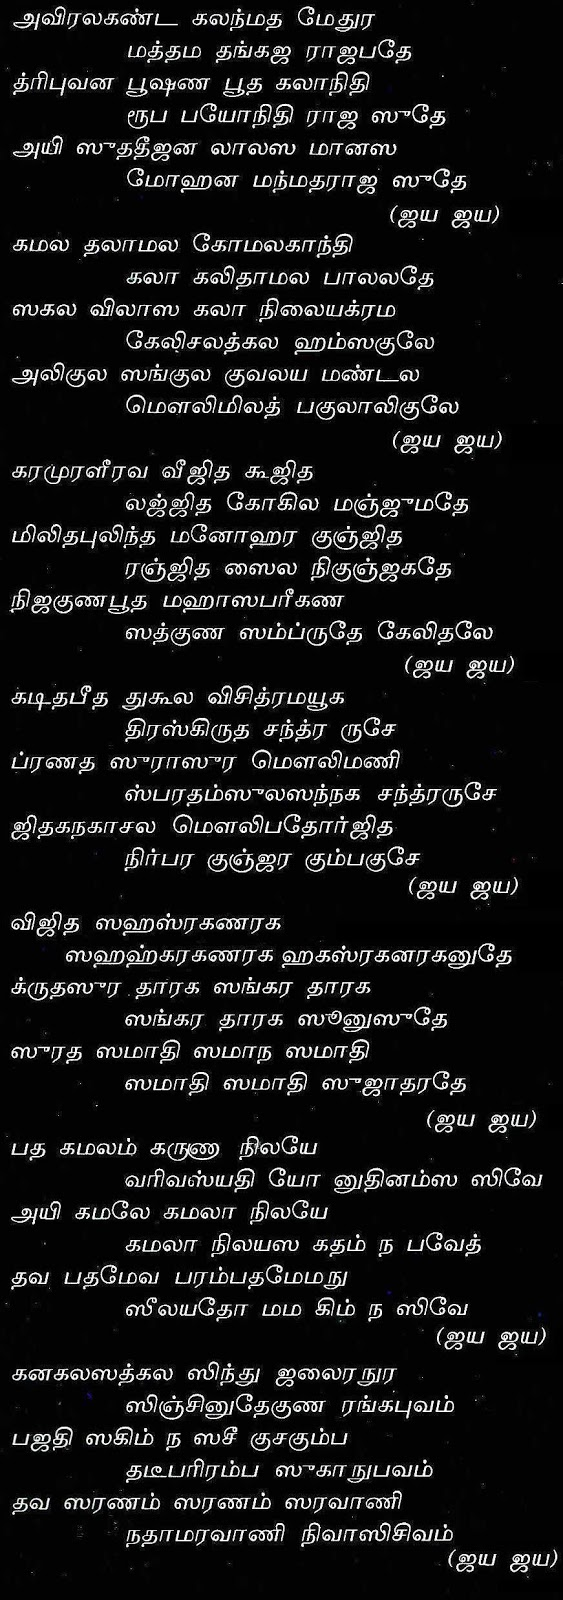 Appu tamil movie song lyrics : Kuckuckskinder film